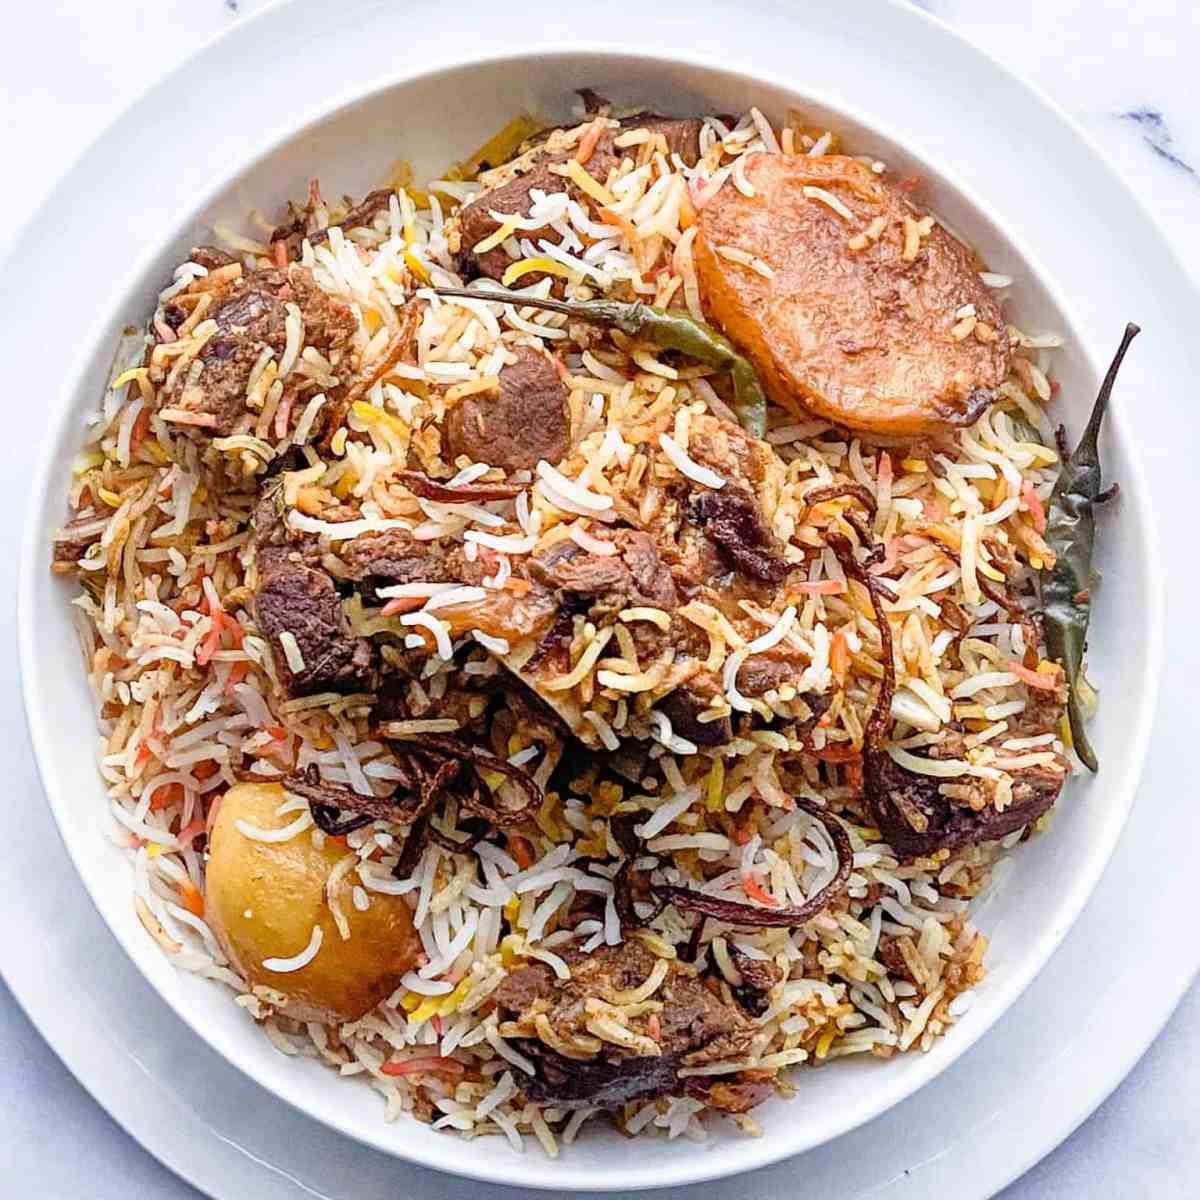 The best Mutton Biryani recipe